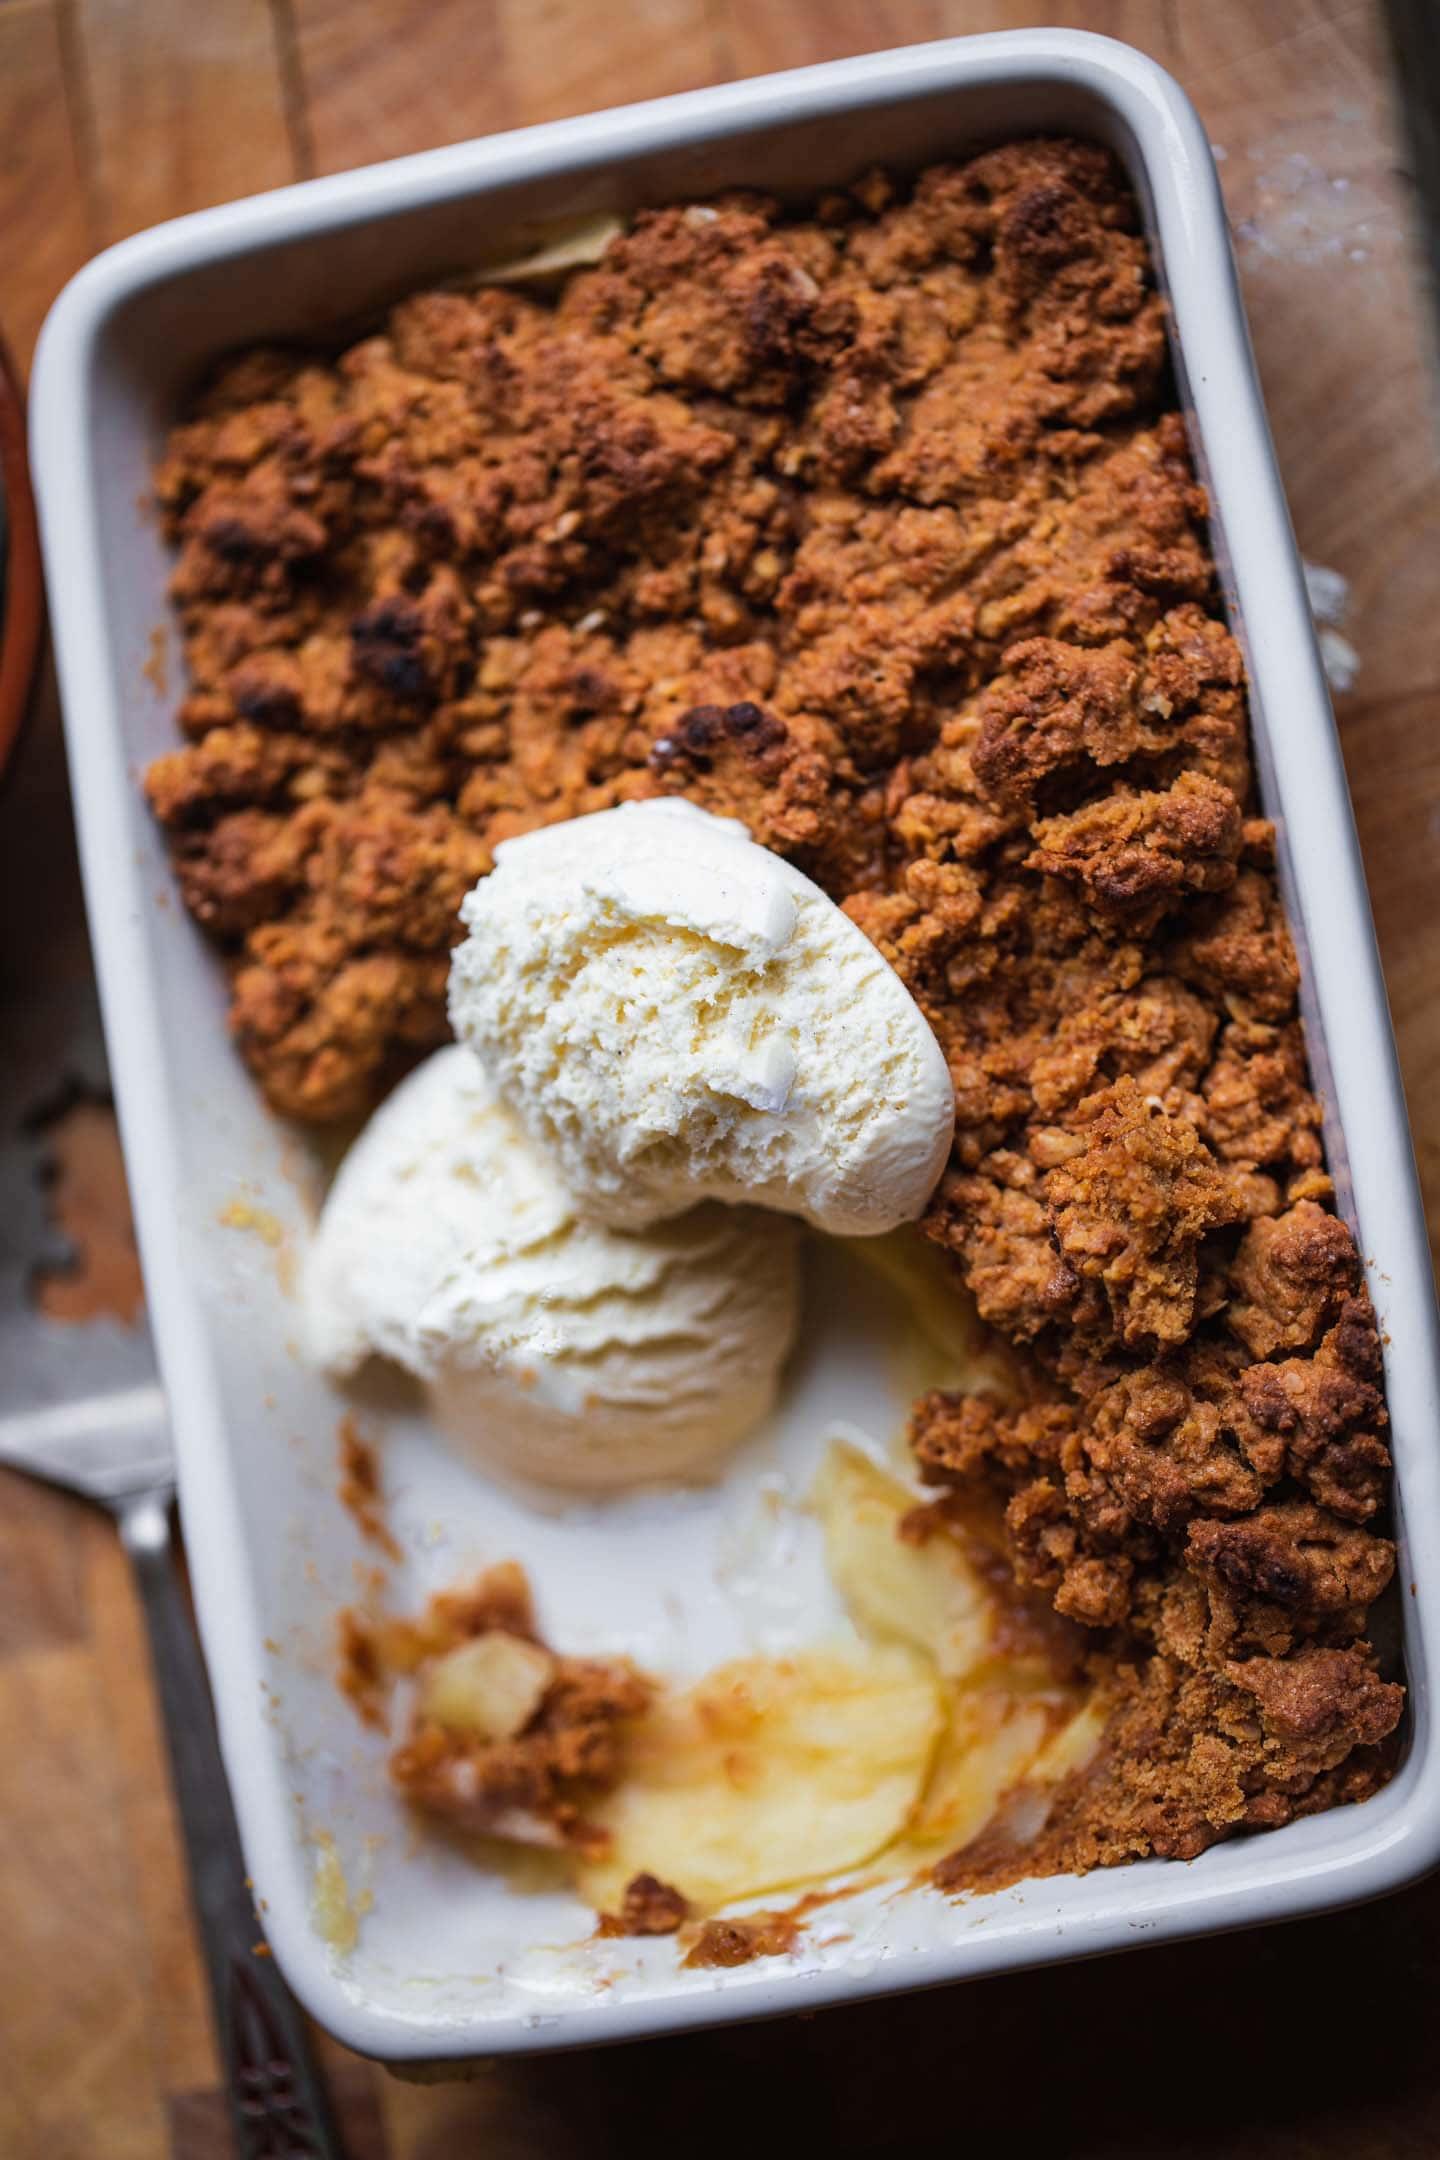 Vegan apple crisp with dairy-free ice cream in a baking dish